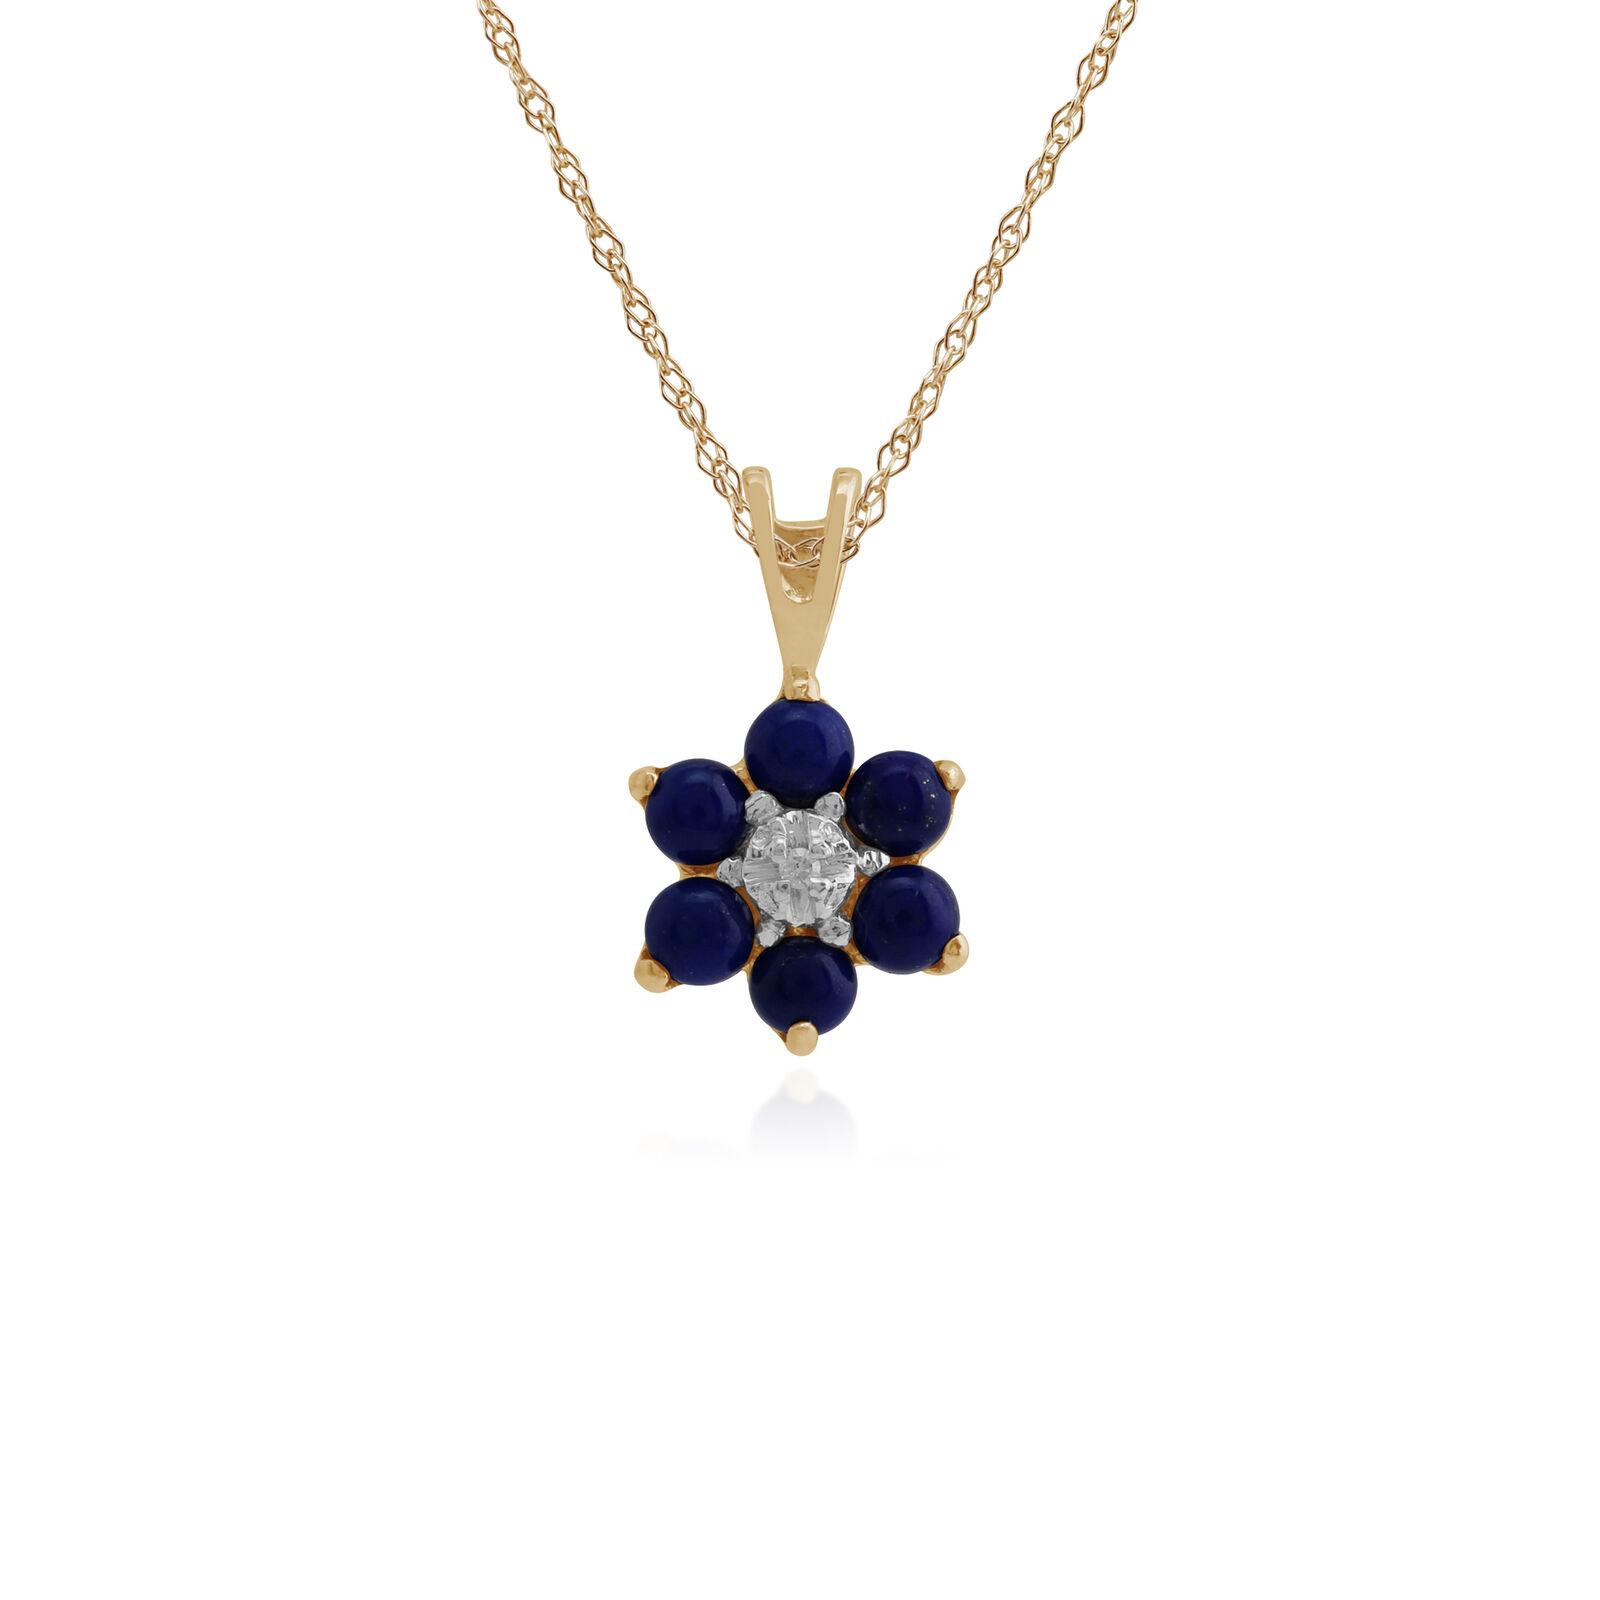 9ct Yellow gold 0.46ct Lapis Lbluei & Diamond Floral Pendant on 45cm Chain